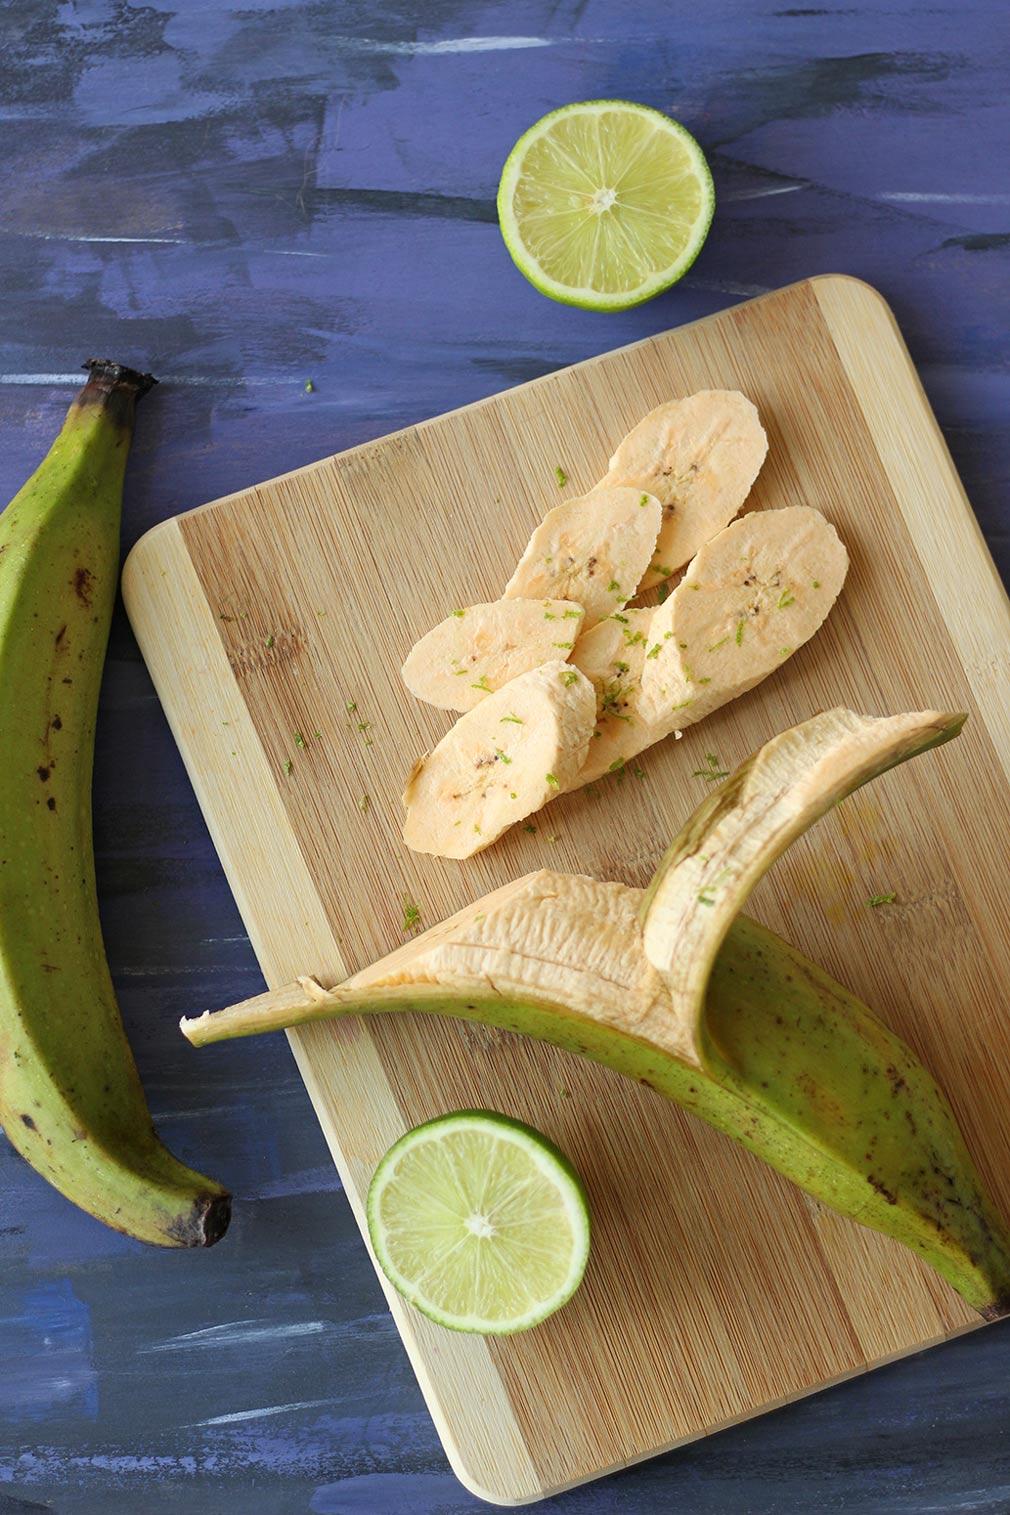 air fryer fried plantain chips plantains guacamole lime chili avocado garlic vegan vegetarian snack easy healthy recipe zenaznzaatar zenandzaatar food blog blogger zena